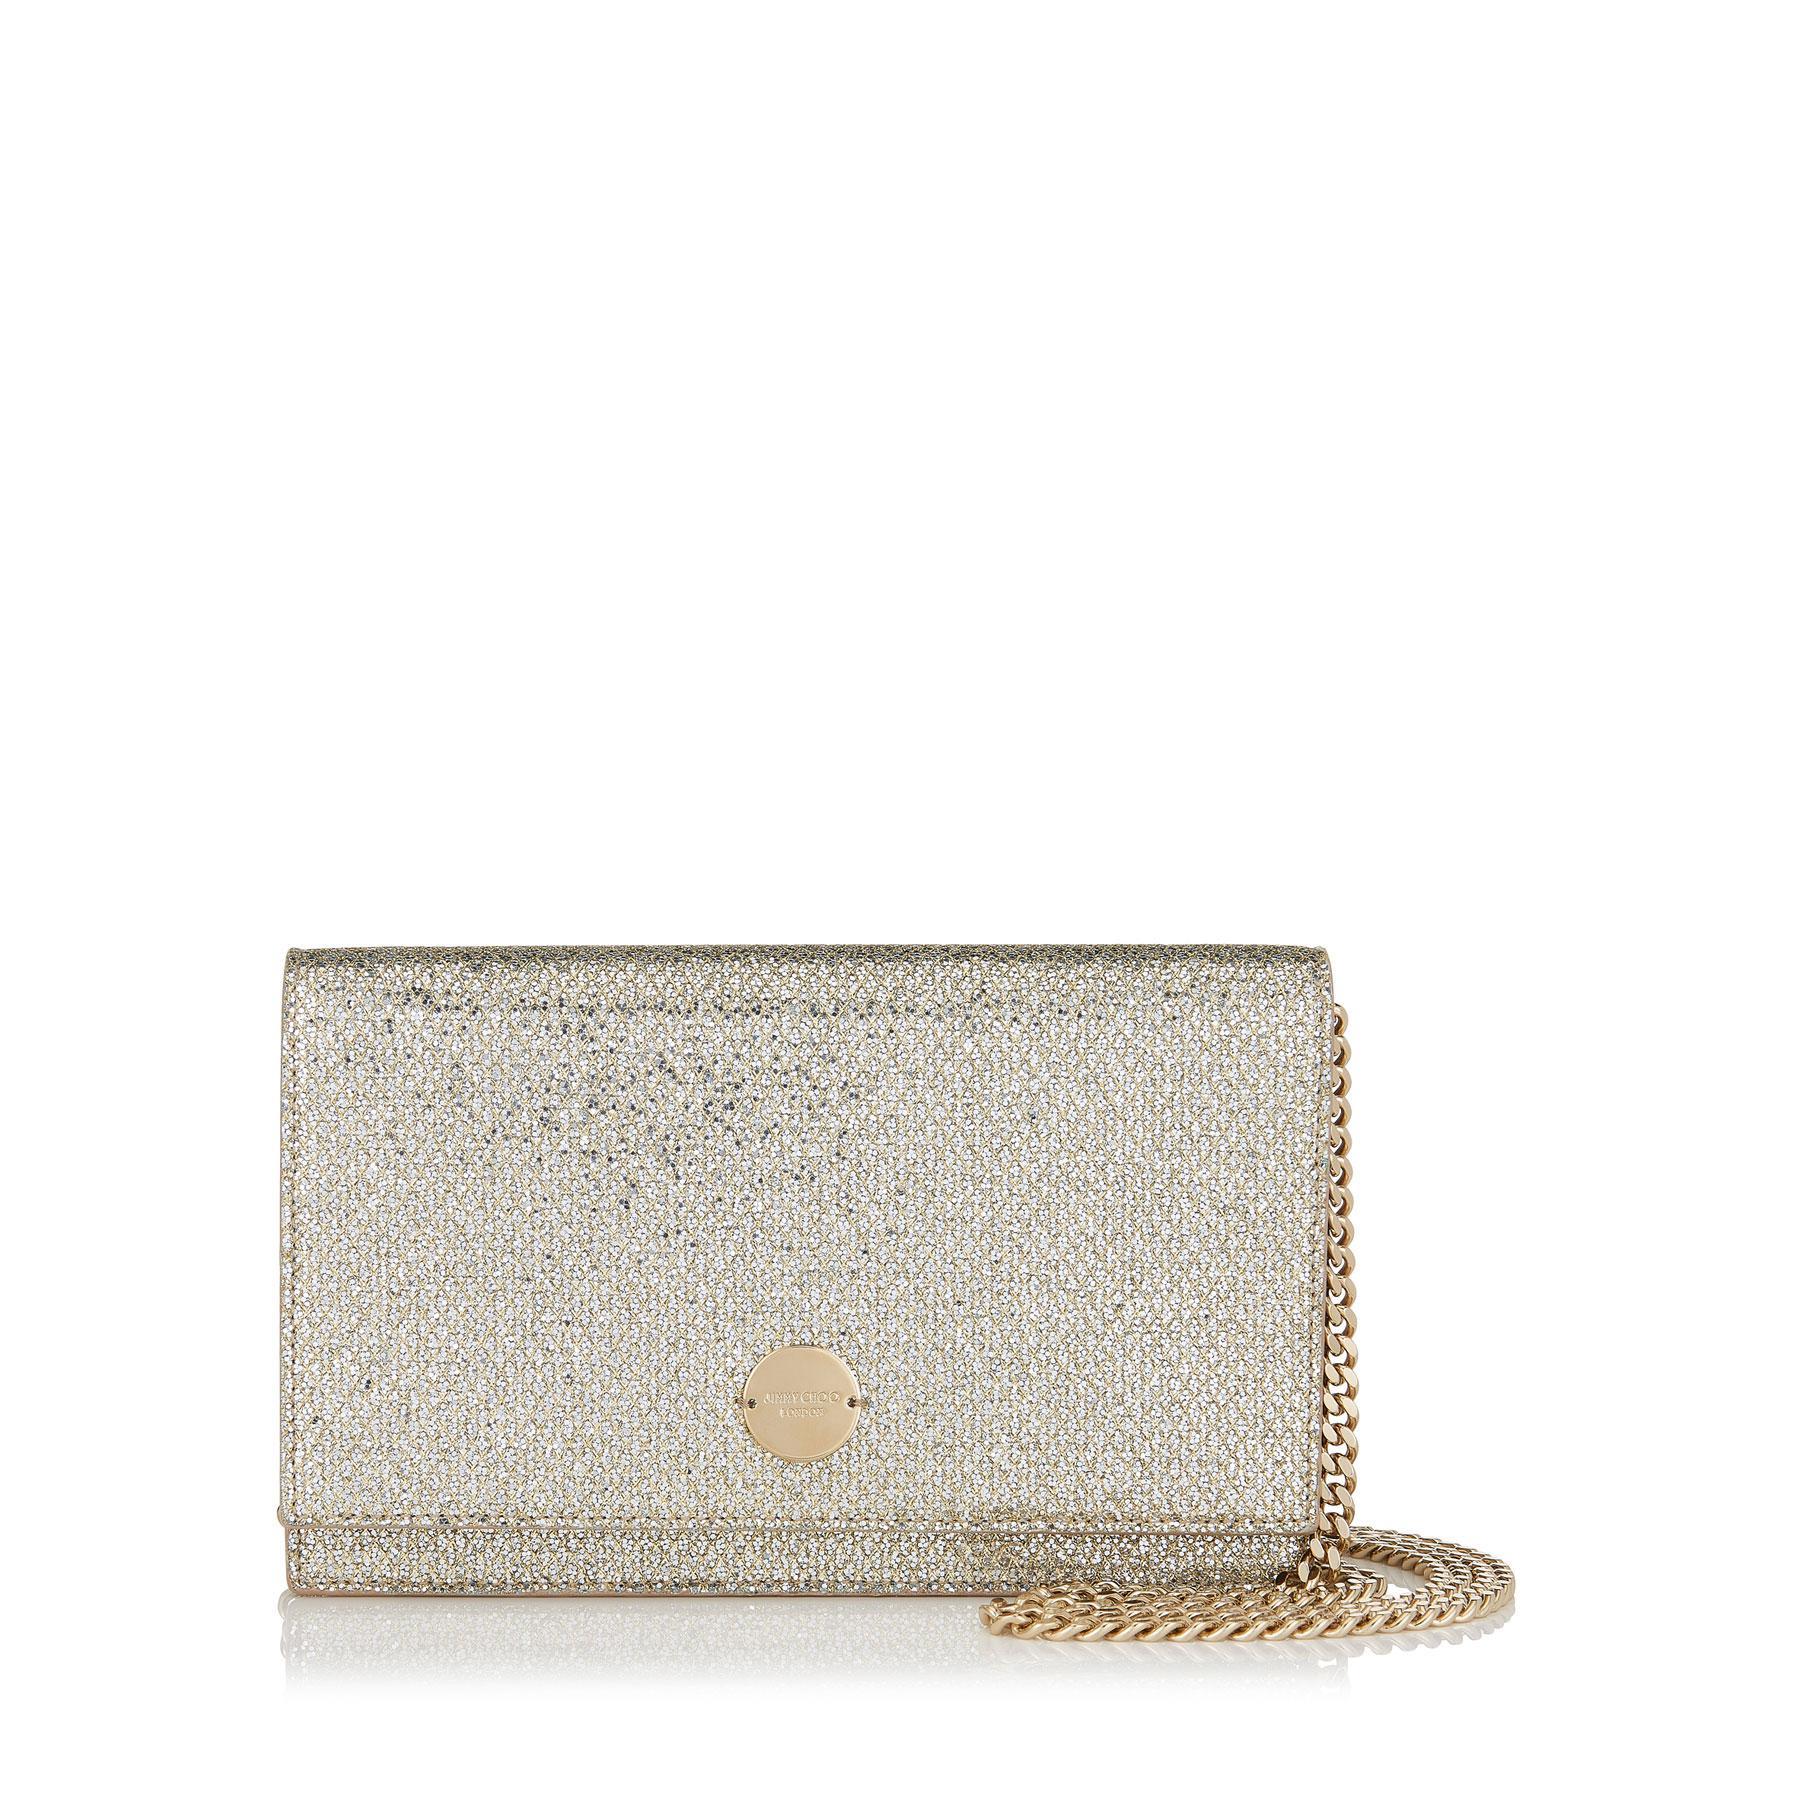 654743cbd84 Jimmy Choo Florence Champagne Glitter Fabric Clutch Bag in Metallic ...